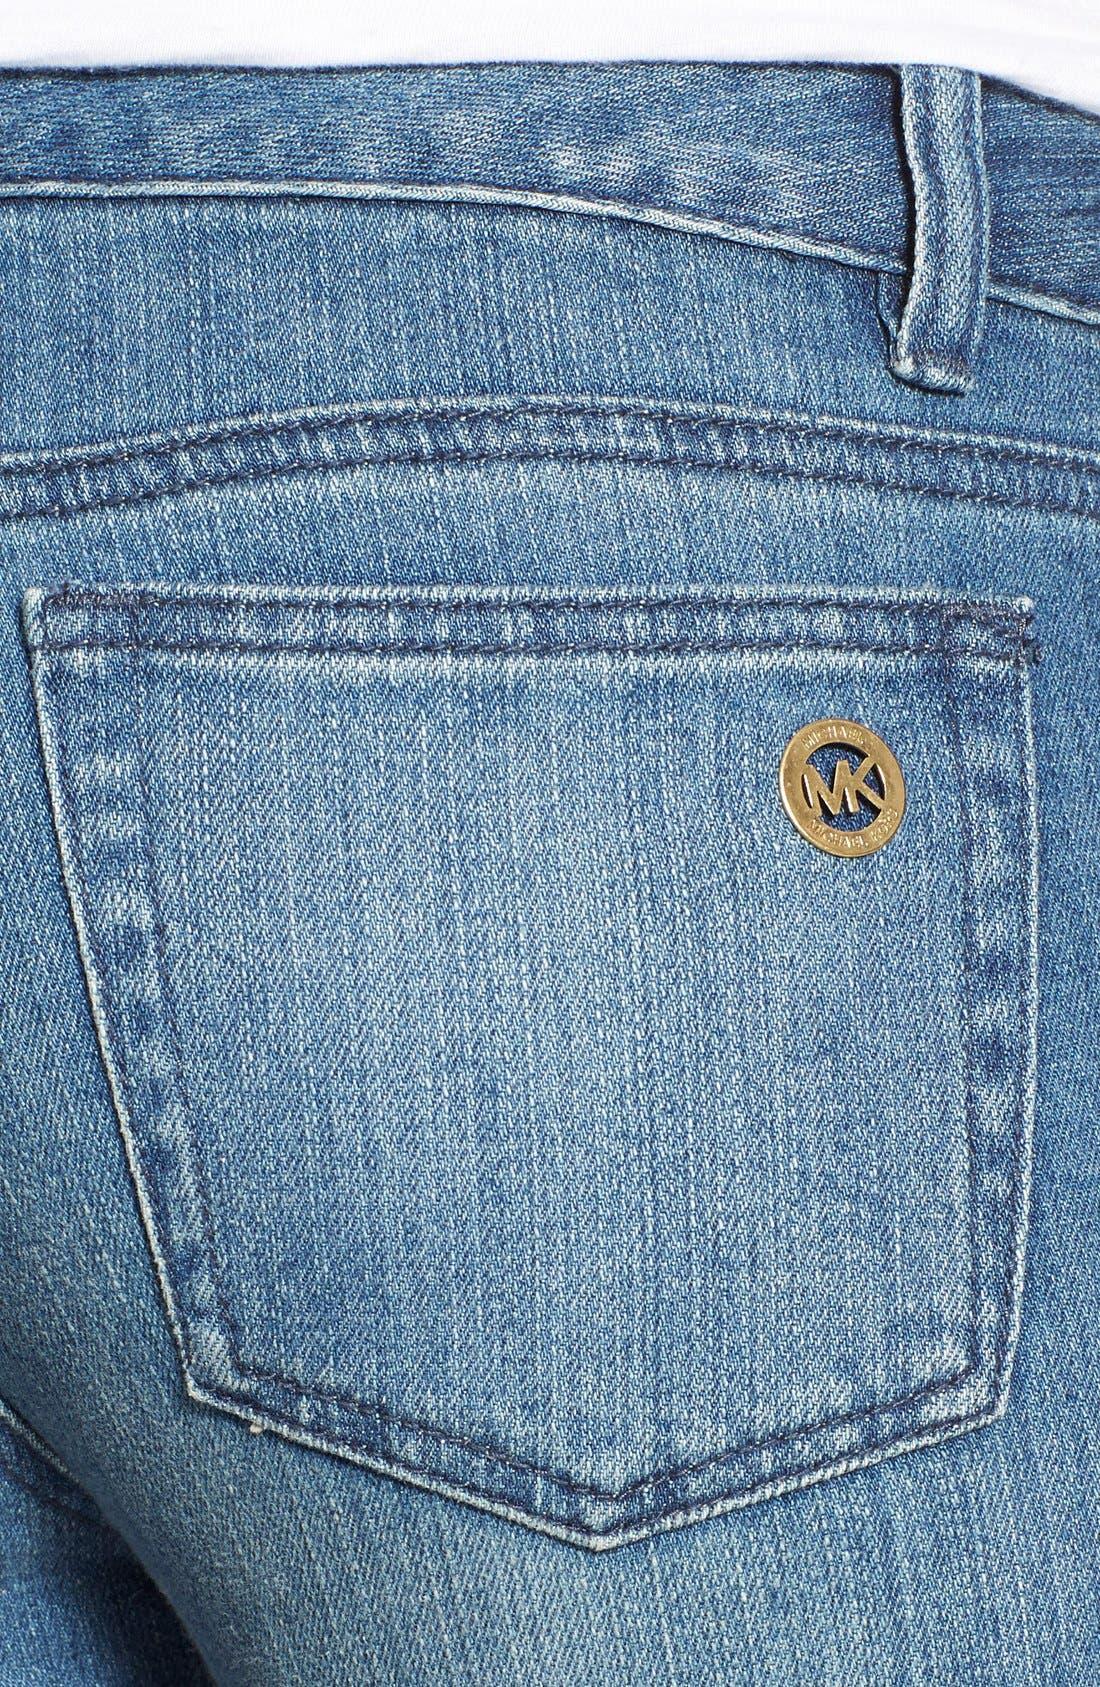 Alternate Image 4  - MICHAEL Michael KorsStretch Zip Pocket Ankle Skinny Jeans(Veruschka)